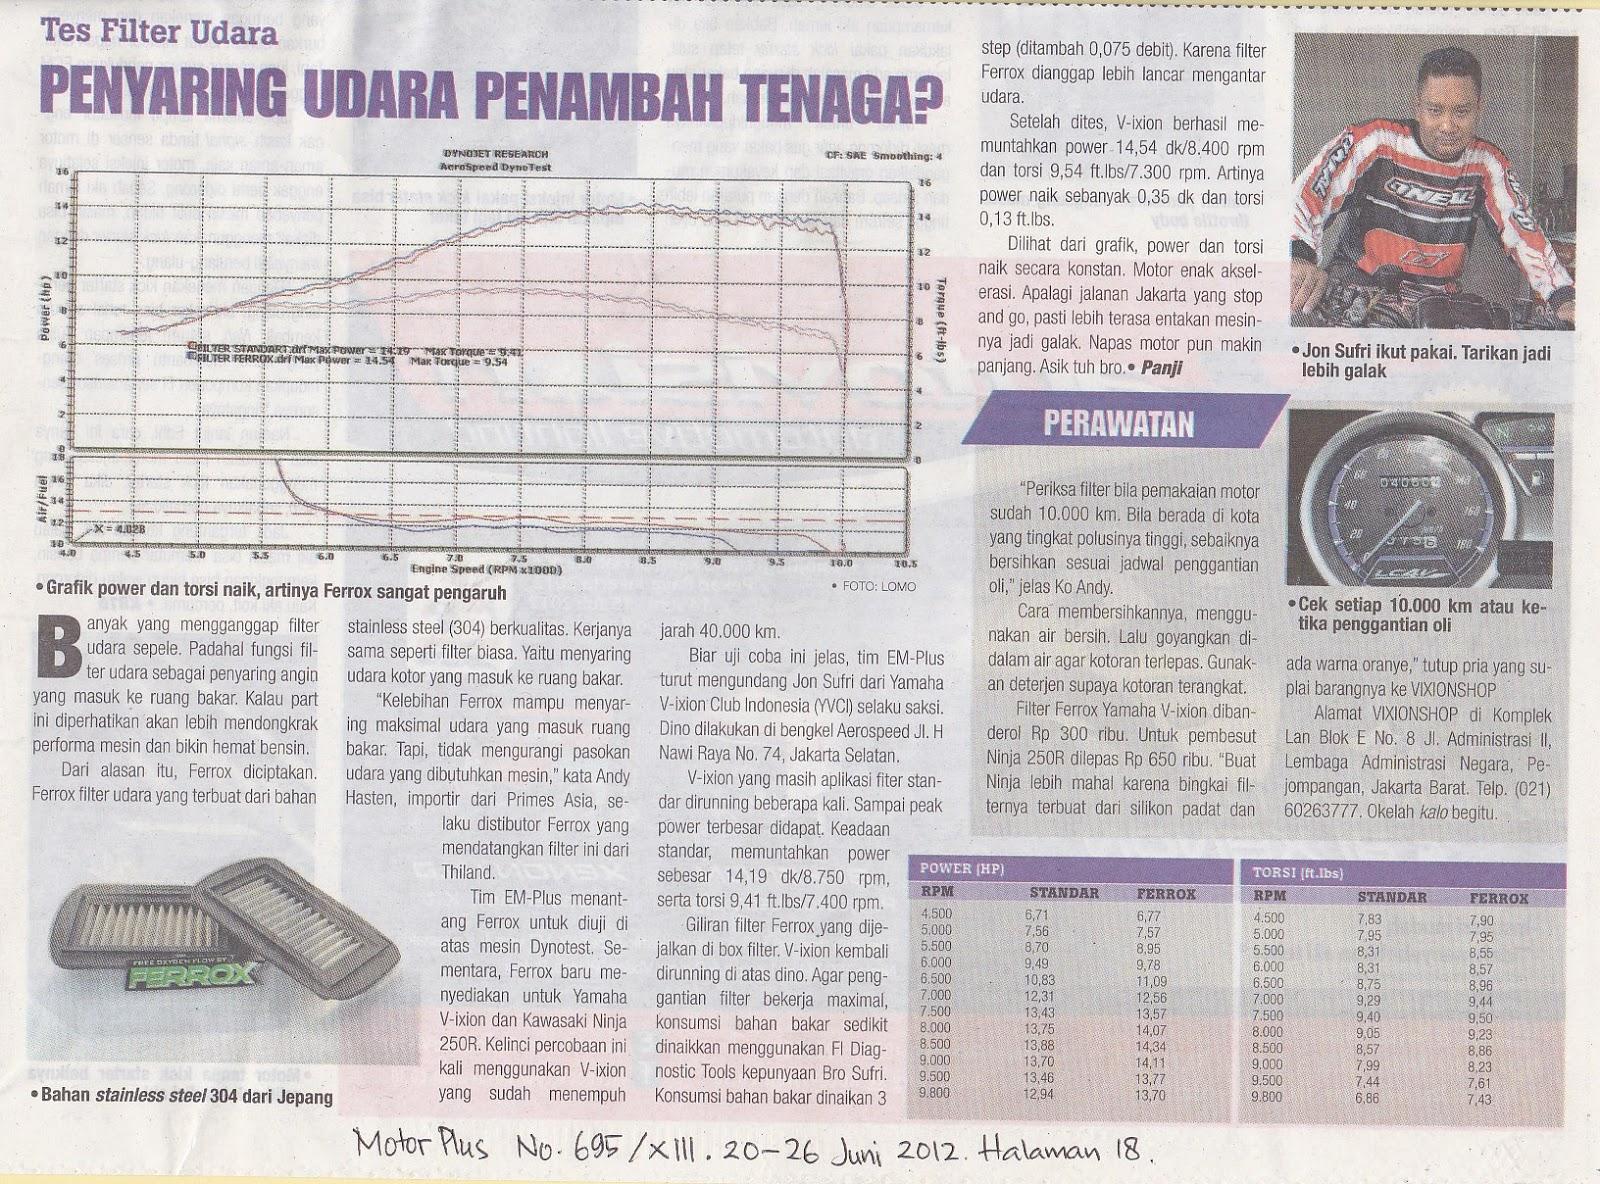 Ferrox Air Filter Meningkatkan Akselerasi Dan Power Kendaraan Saringan Udara Honda Tiger Testimoni